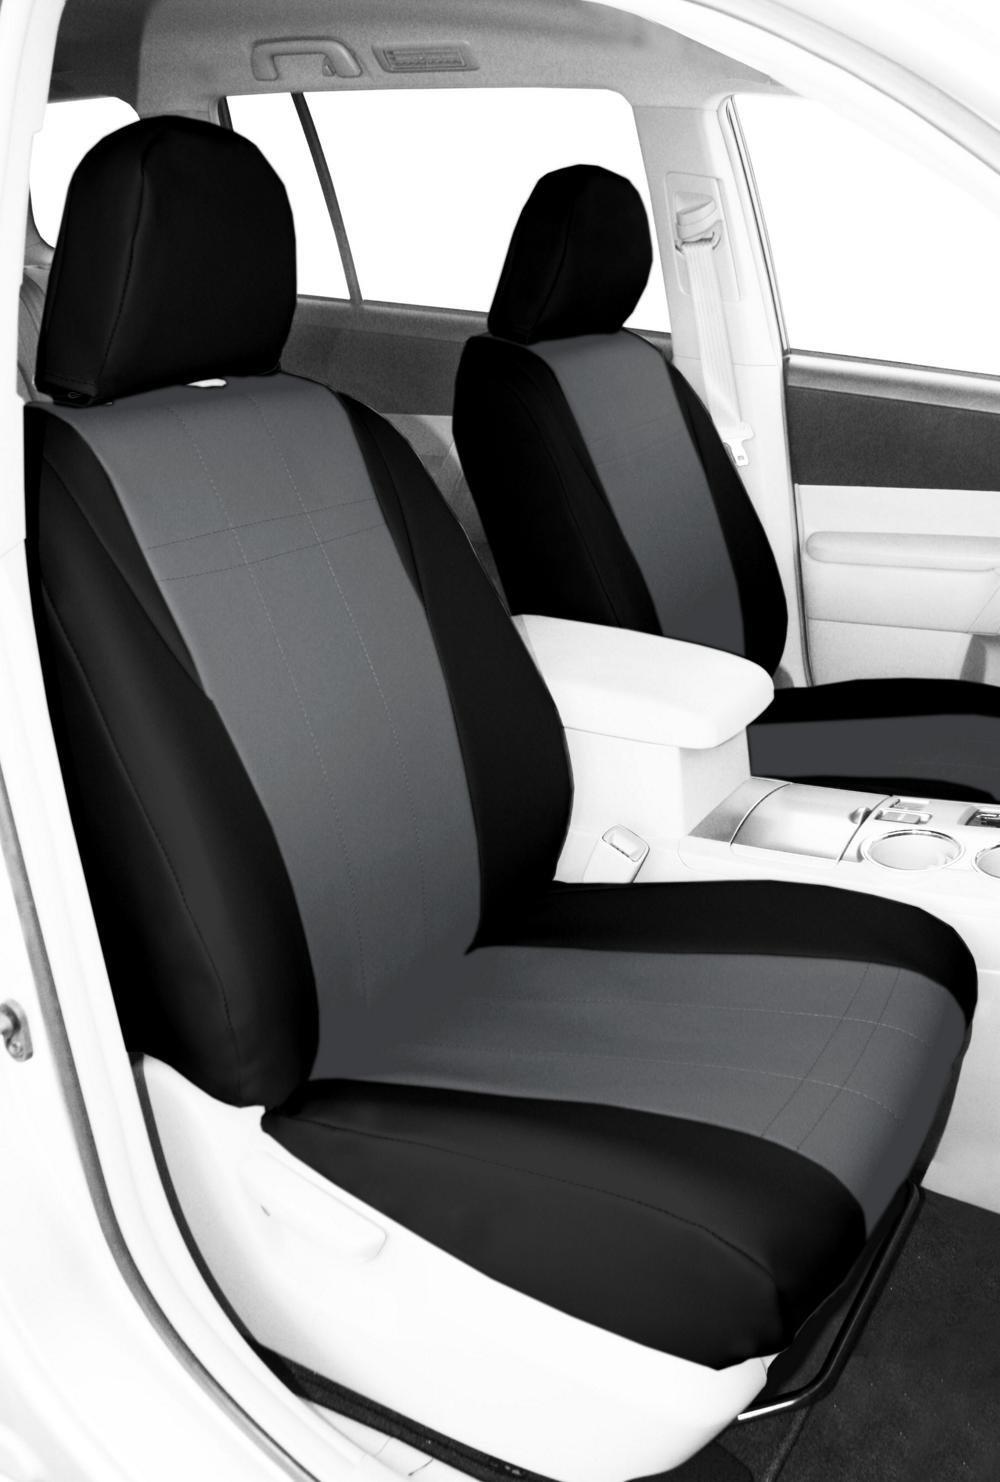 Amazon com: CalTrend JP216-08LB Front Bucket Custom Fit Seat Cover